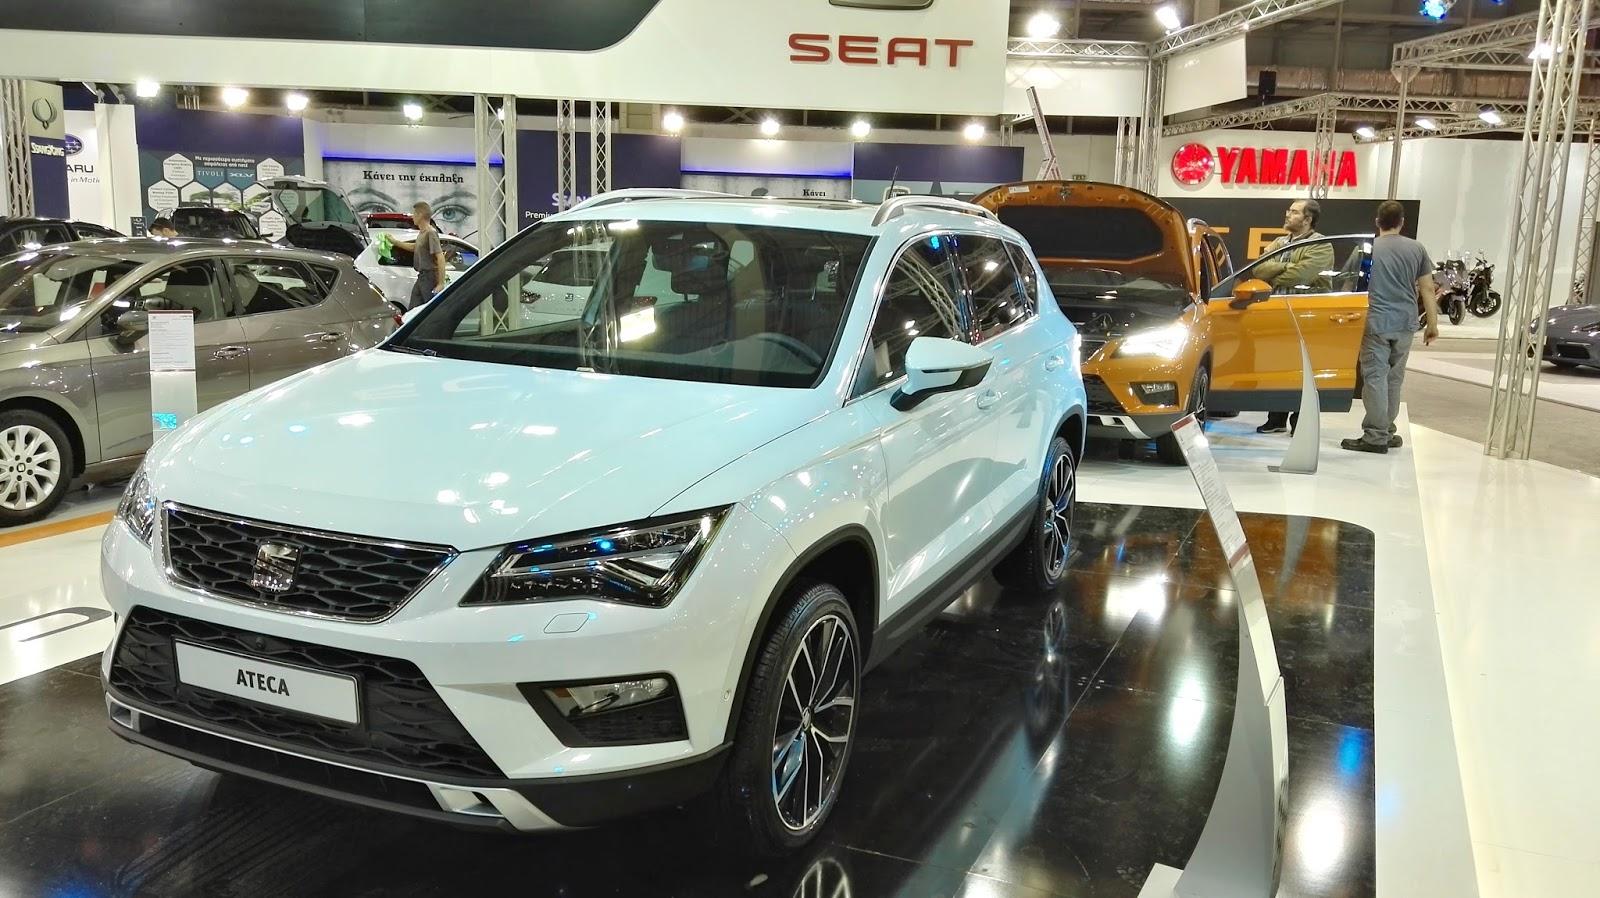 seat2Bateca Τα μοντέλα που ξεχωρίσαμε στην Αυτοκίνηση 2016 zblog, Αυτοκίνηση